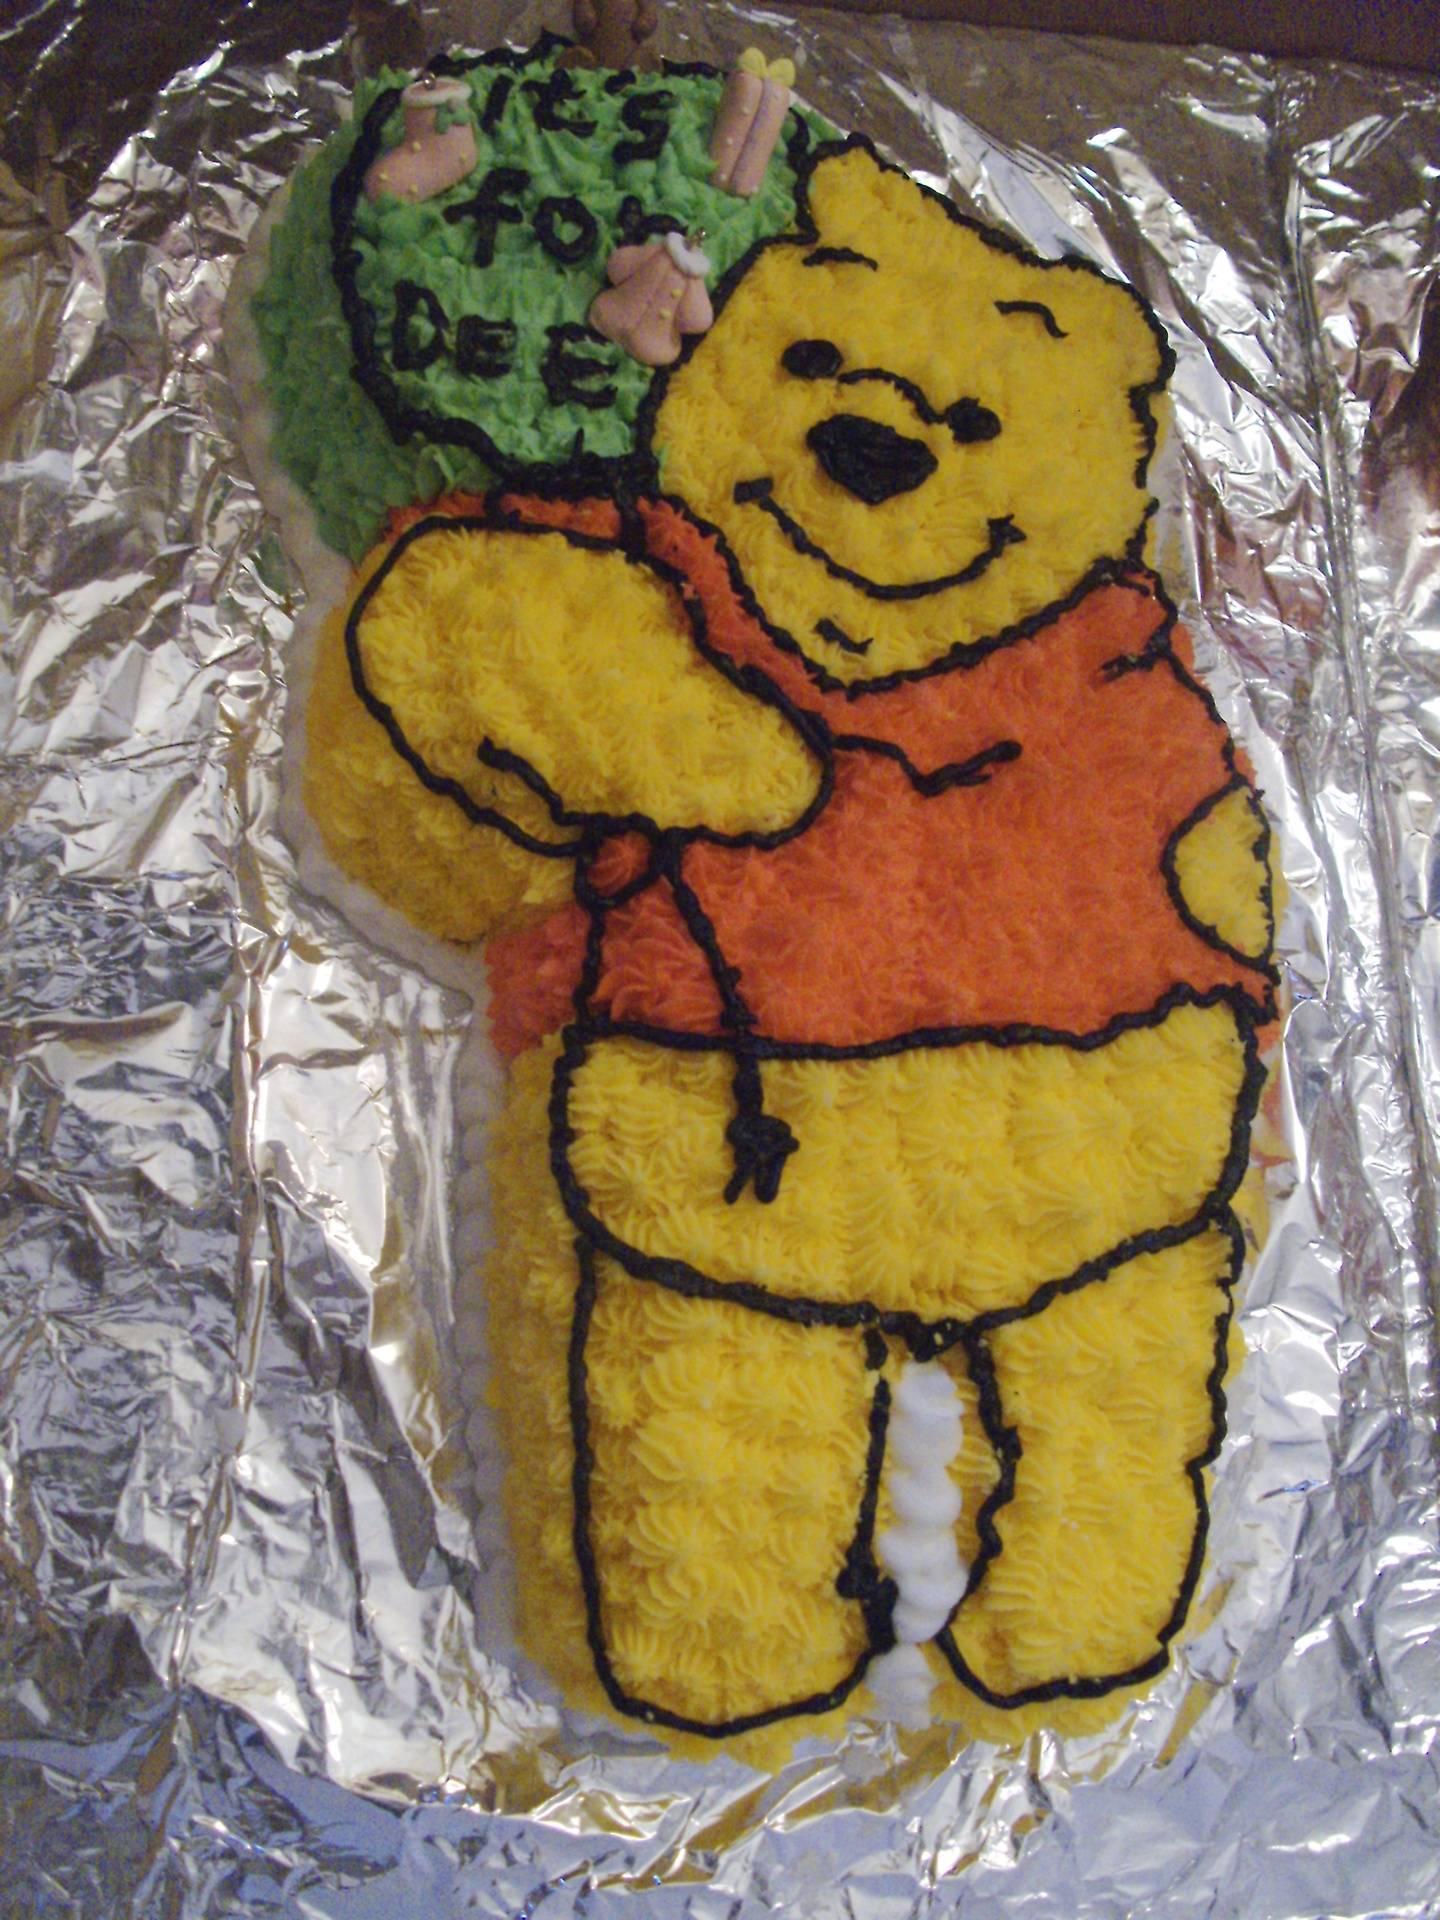 A Winnie Pooh Cake